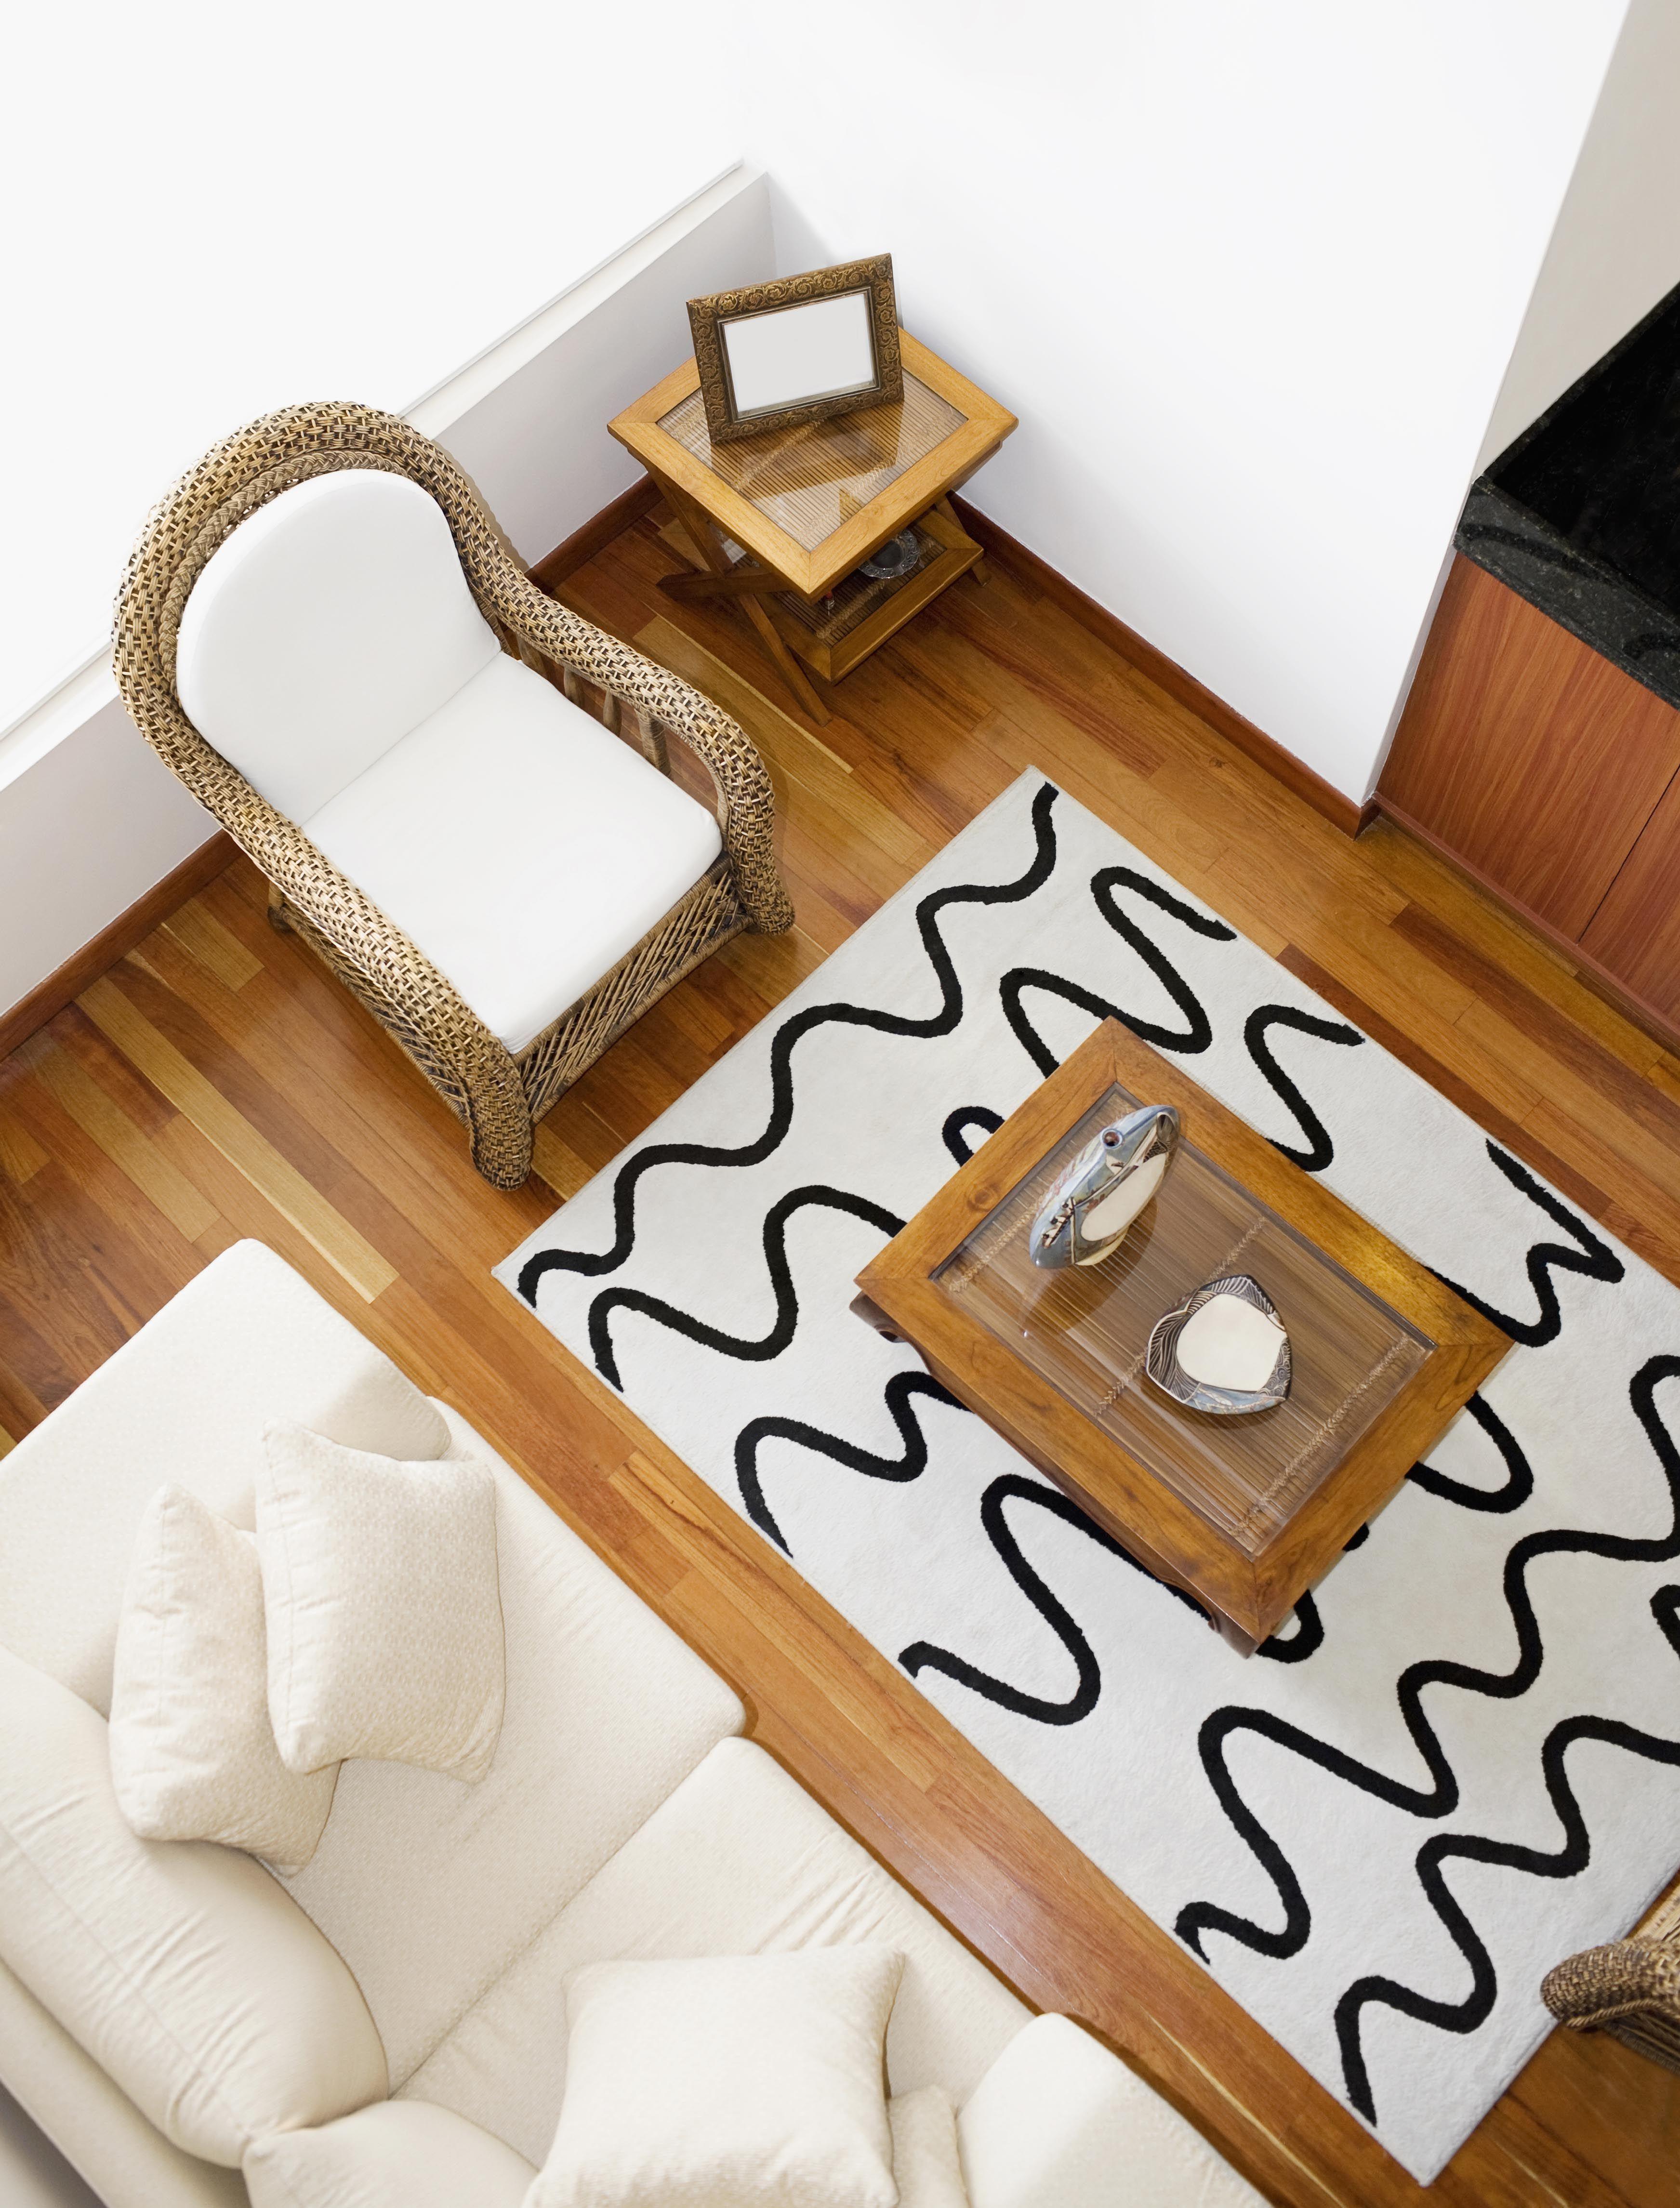 interior designer. What Interior Designers Notice - Things Every Designer Notices In New Homes